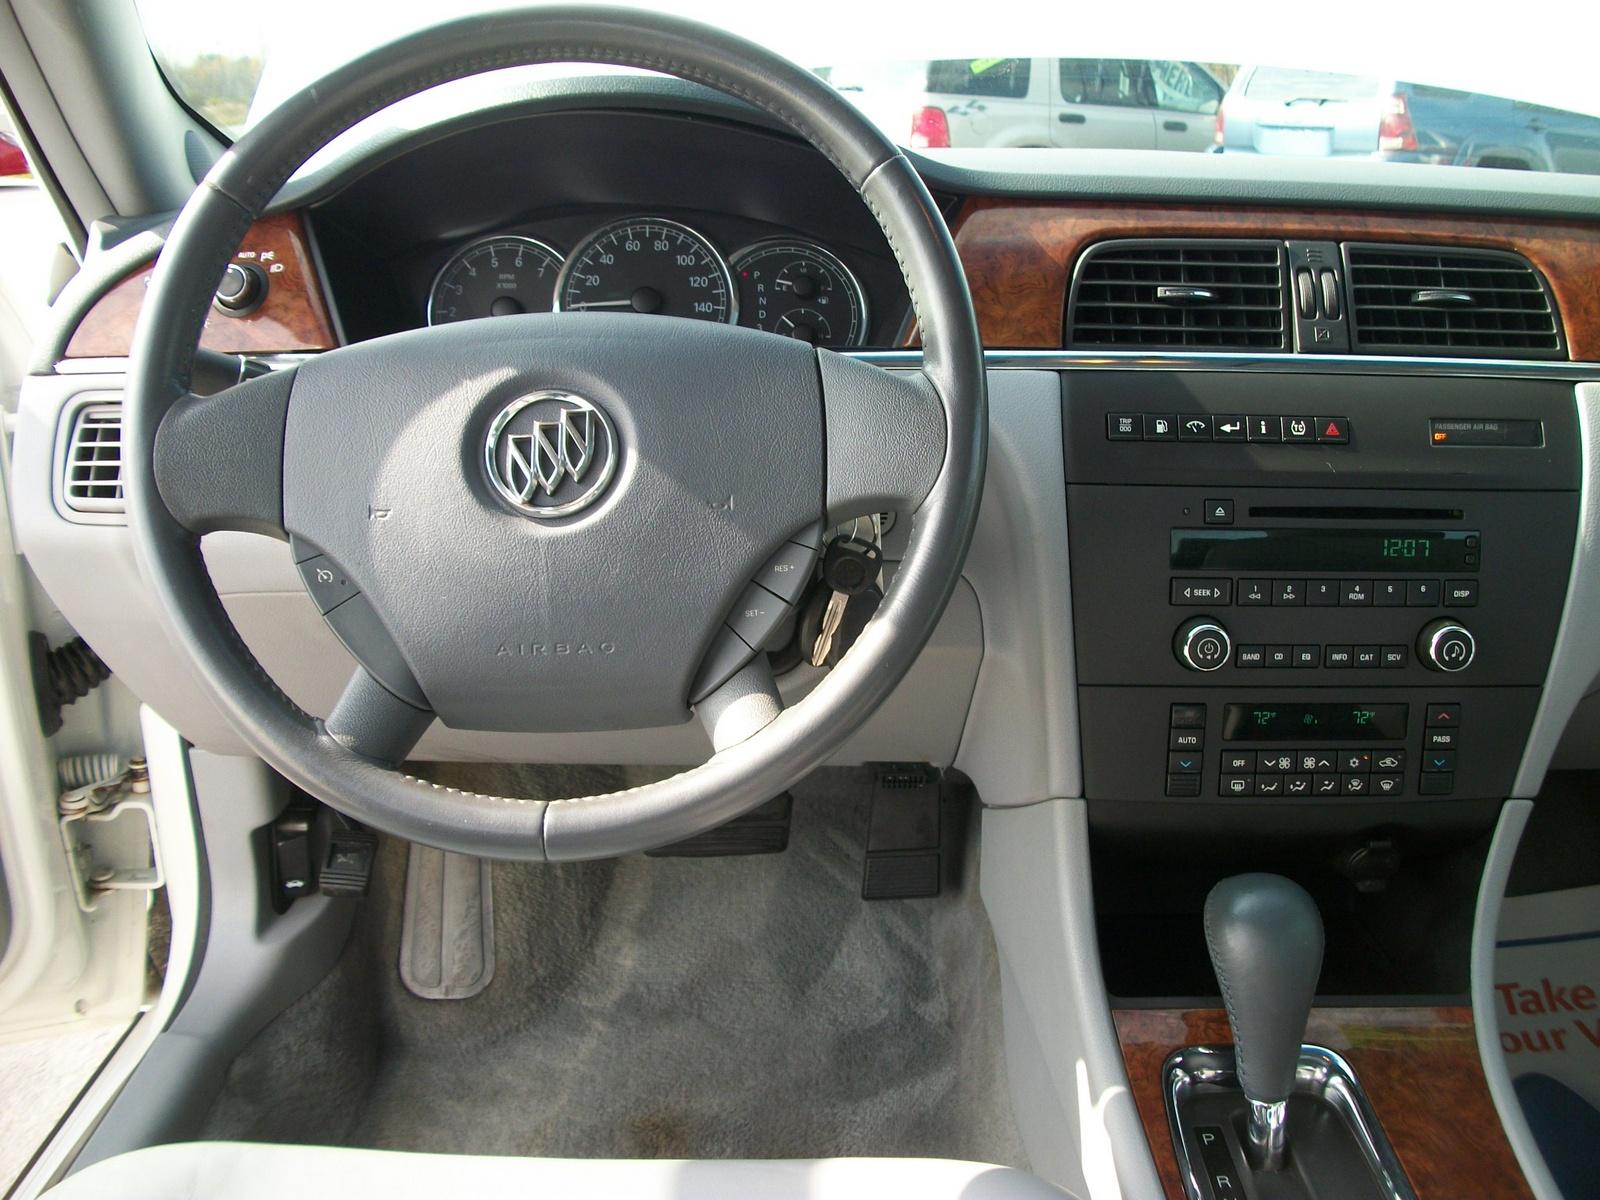 Buick Lacrosse Cxl Pic on 2008 Buick Lacrosse Cxl